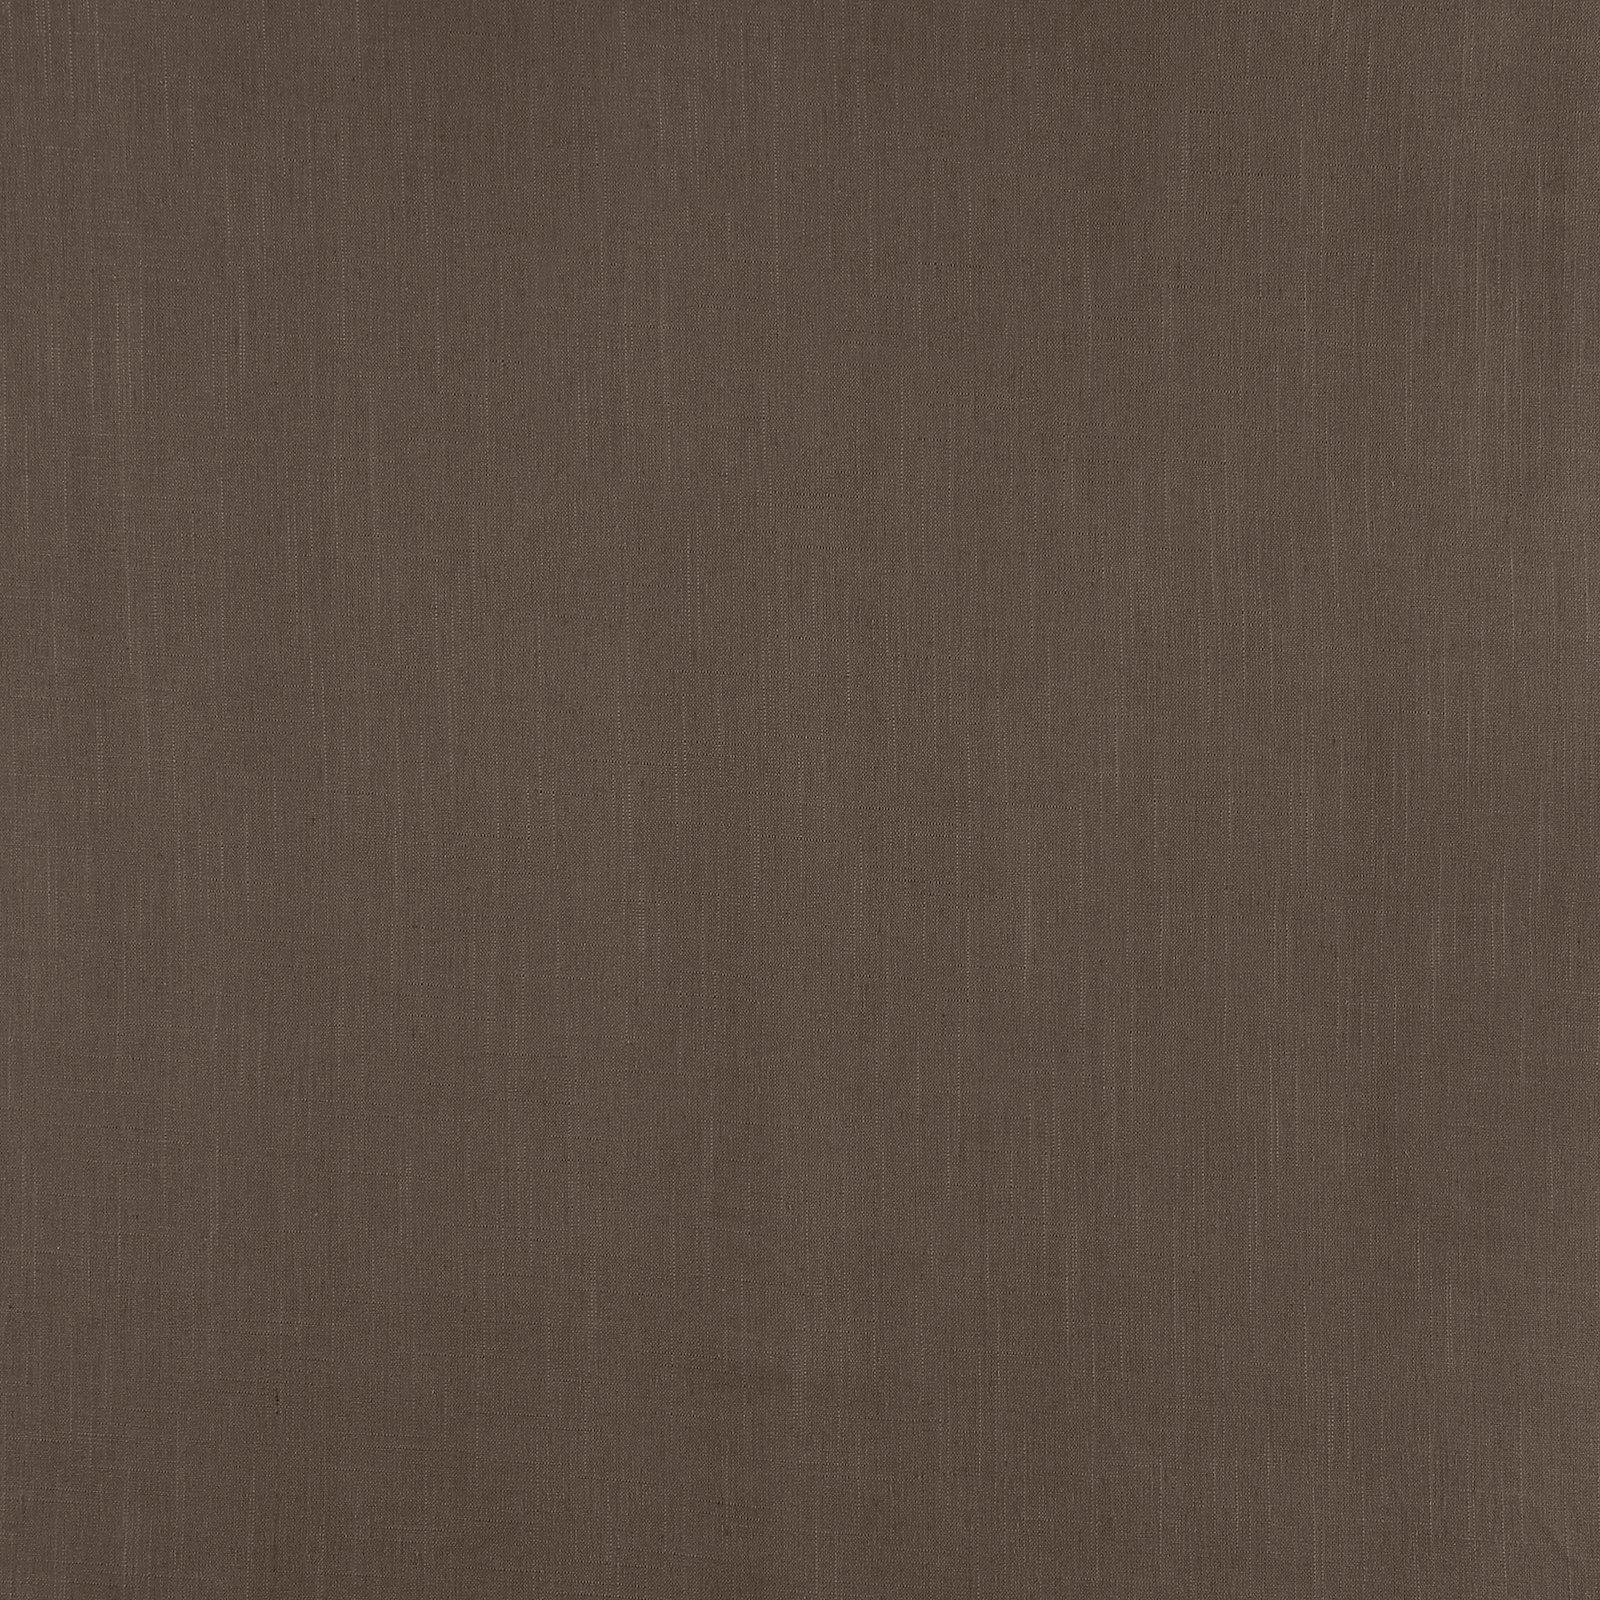 Coarse linen/viscose warm walnut 852392_pack_solid